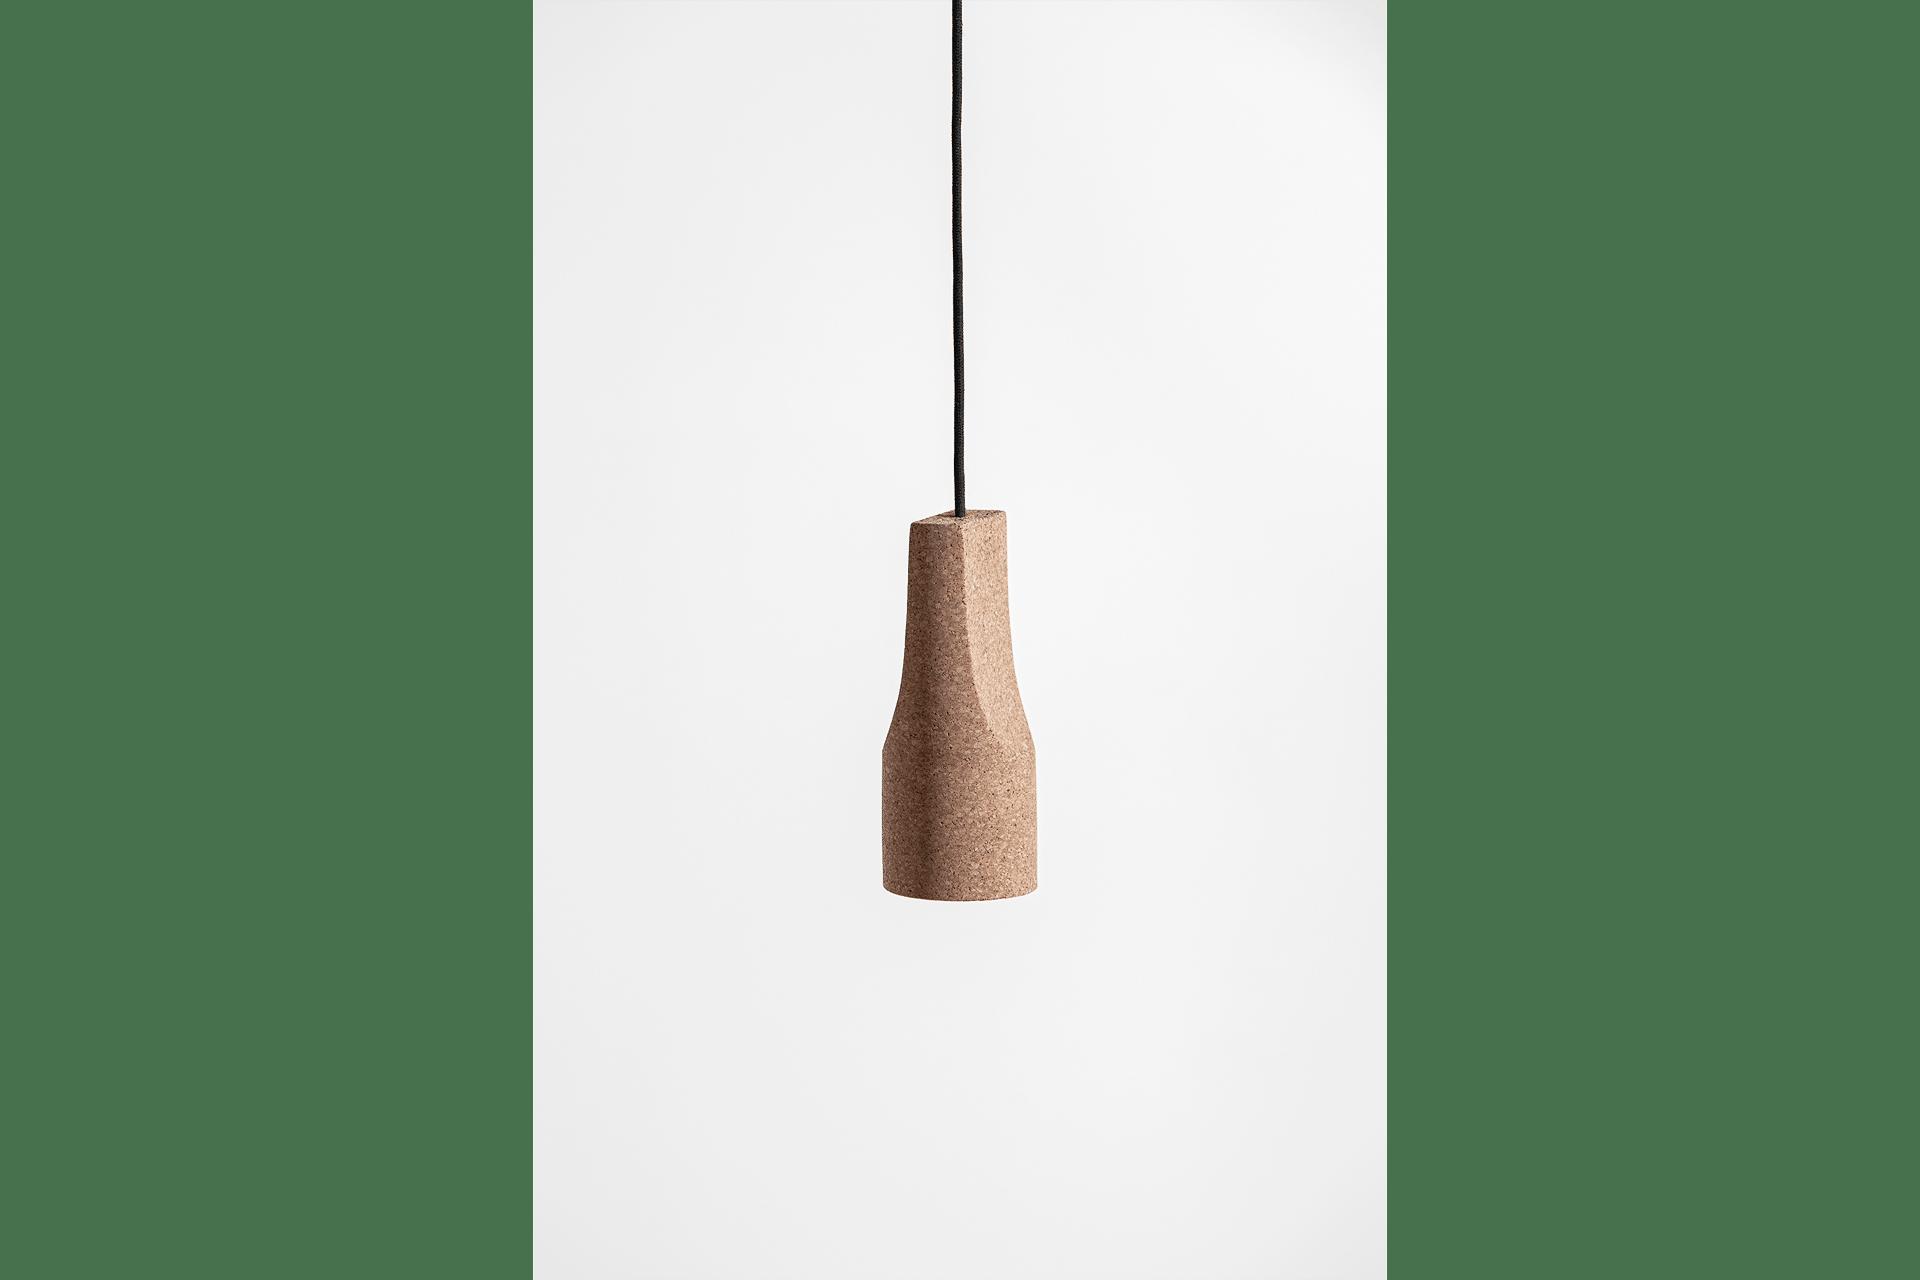 Cork Hanging Lamp - DESIGN BY MIGUEL SOEIRO